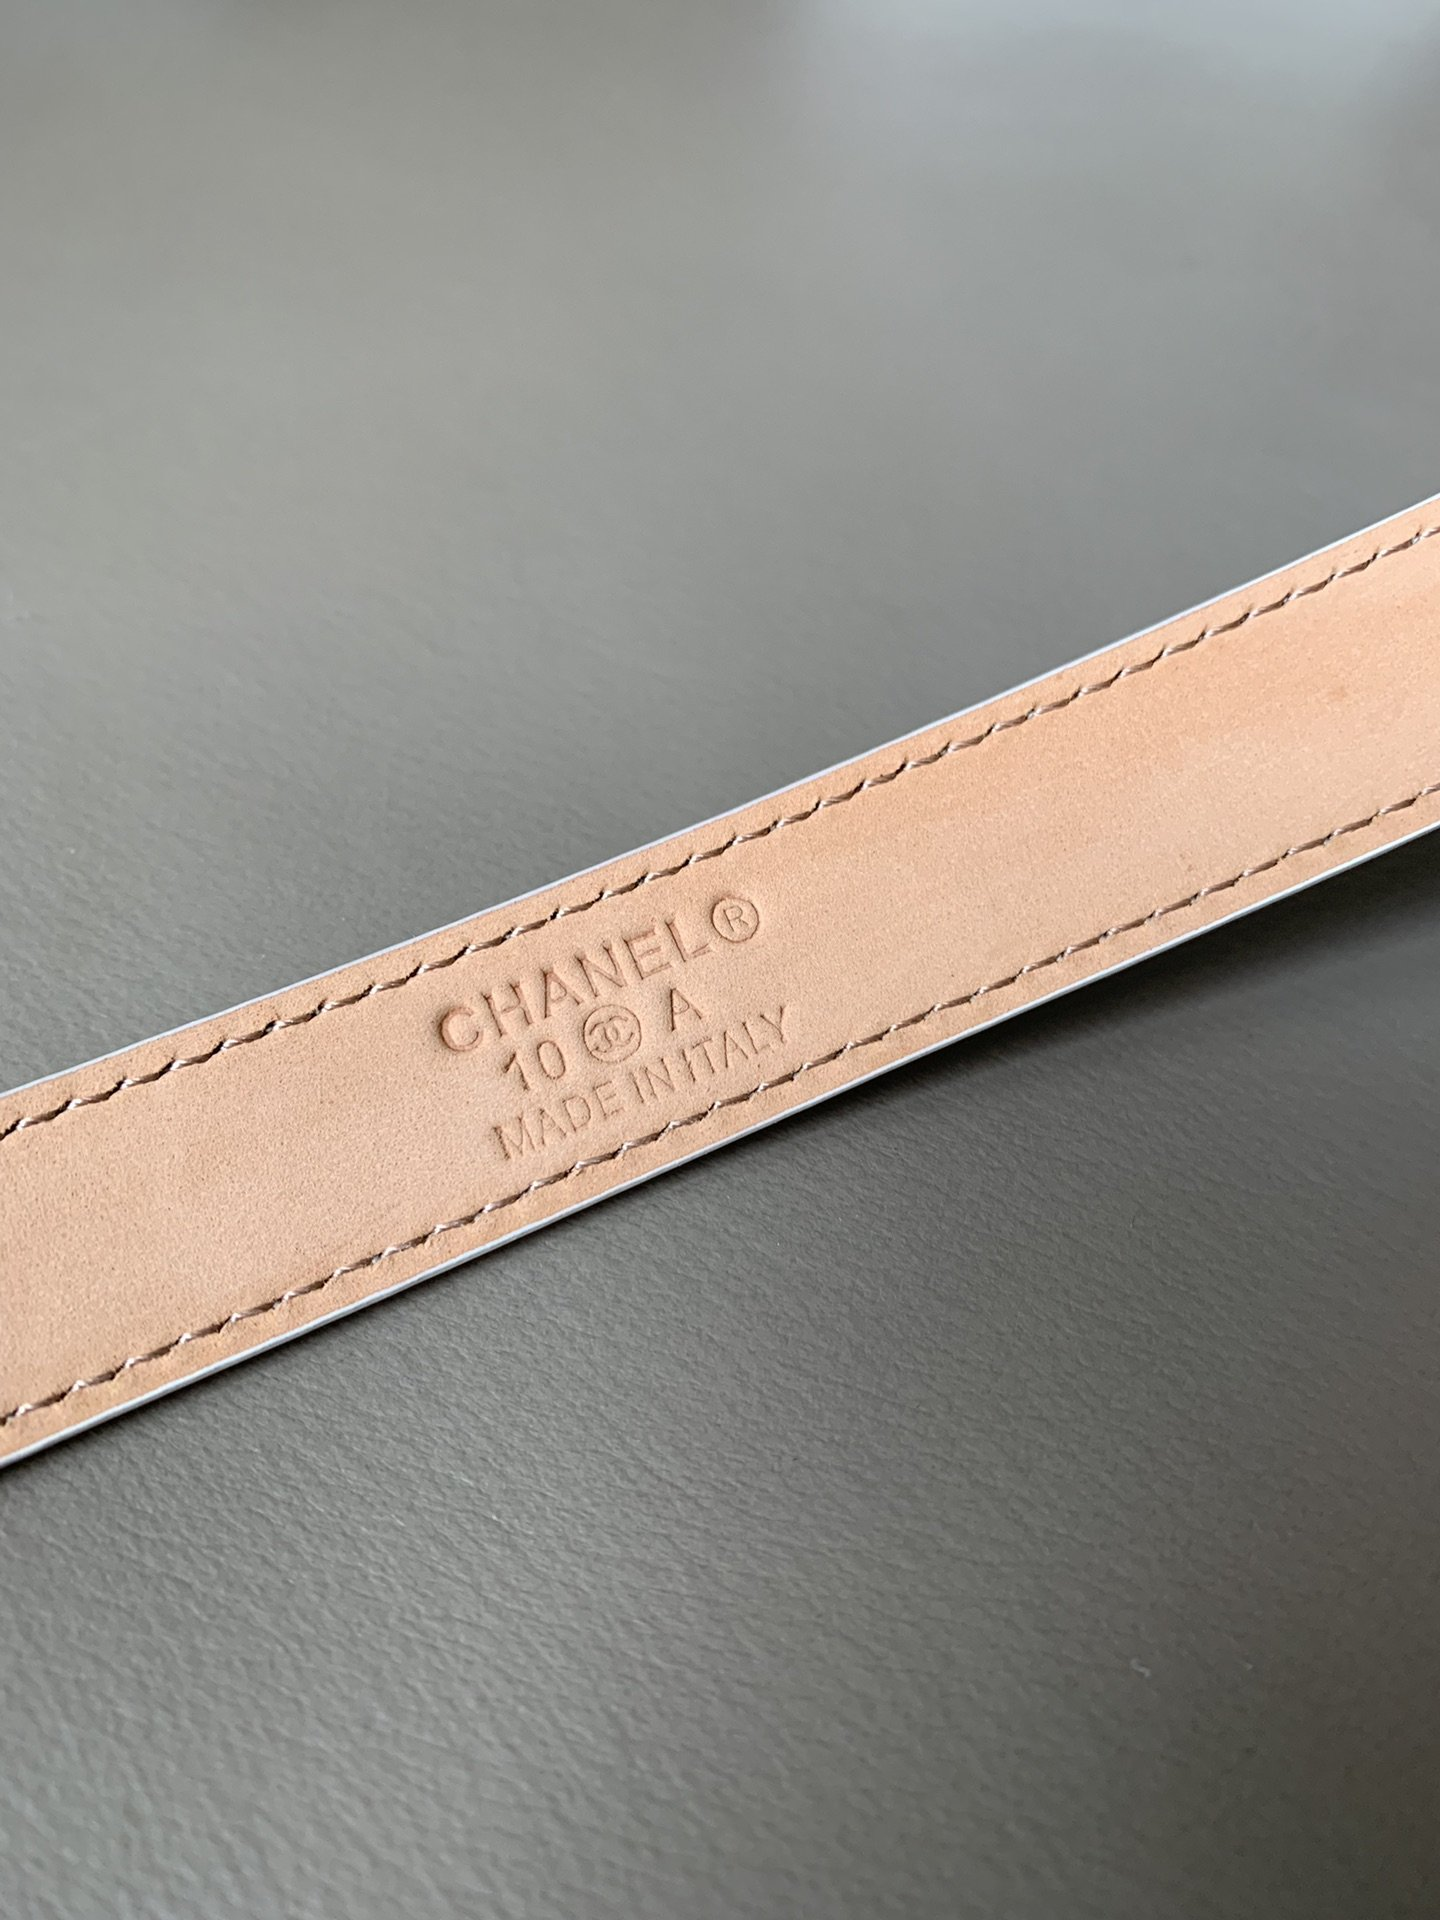 Chanel香奈儿专柜新款 高端女士休闲细腰带(图5)